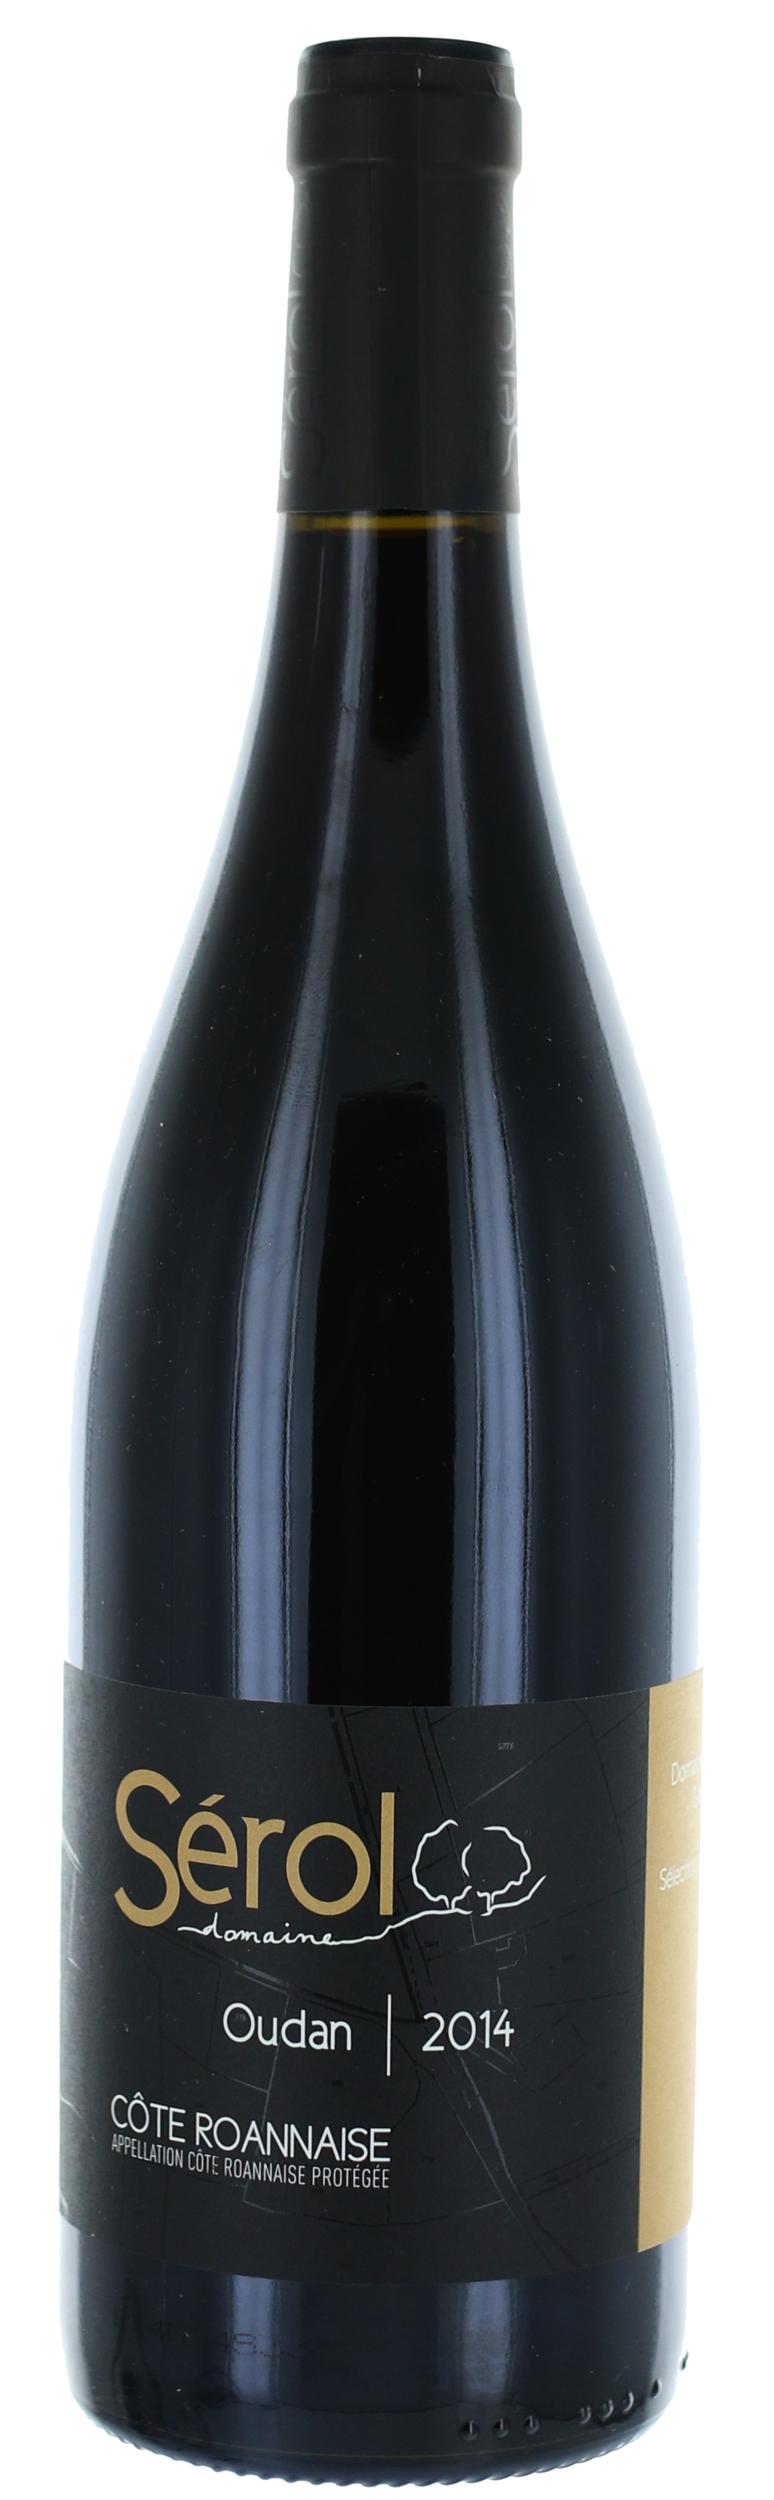 Côtes Roannaise - Oudan - Domaine Sérol - 2018 - BIO